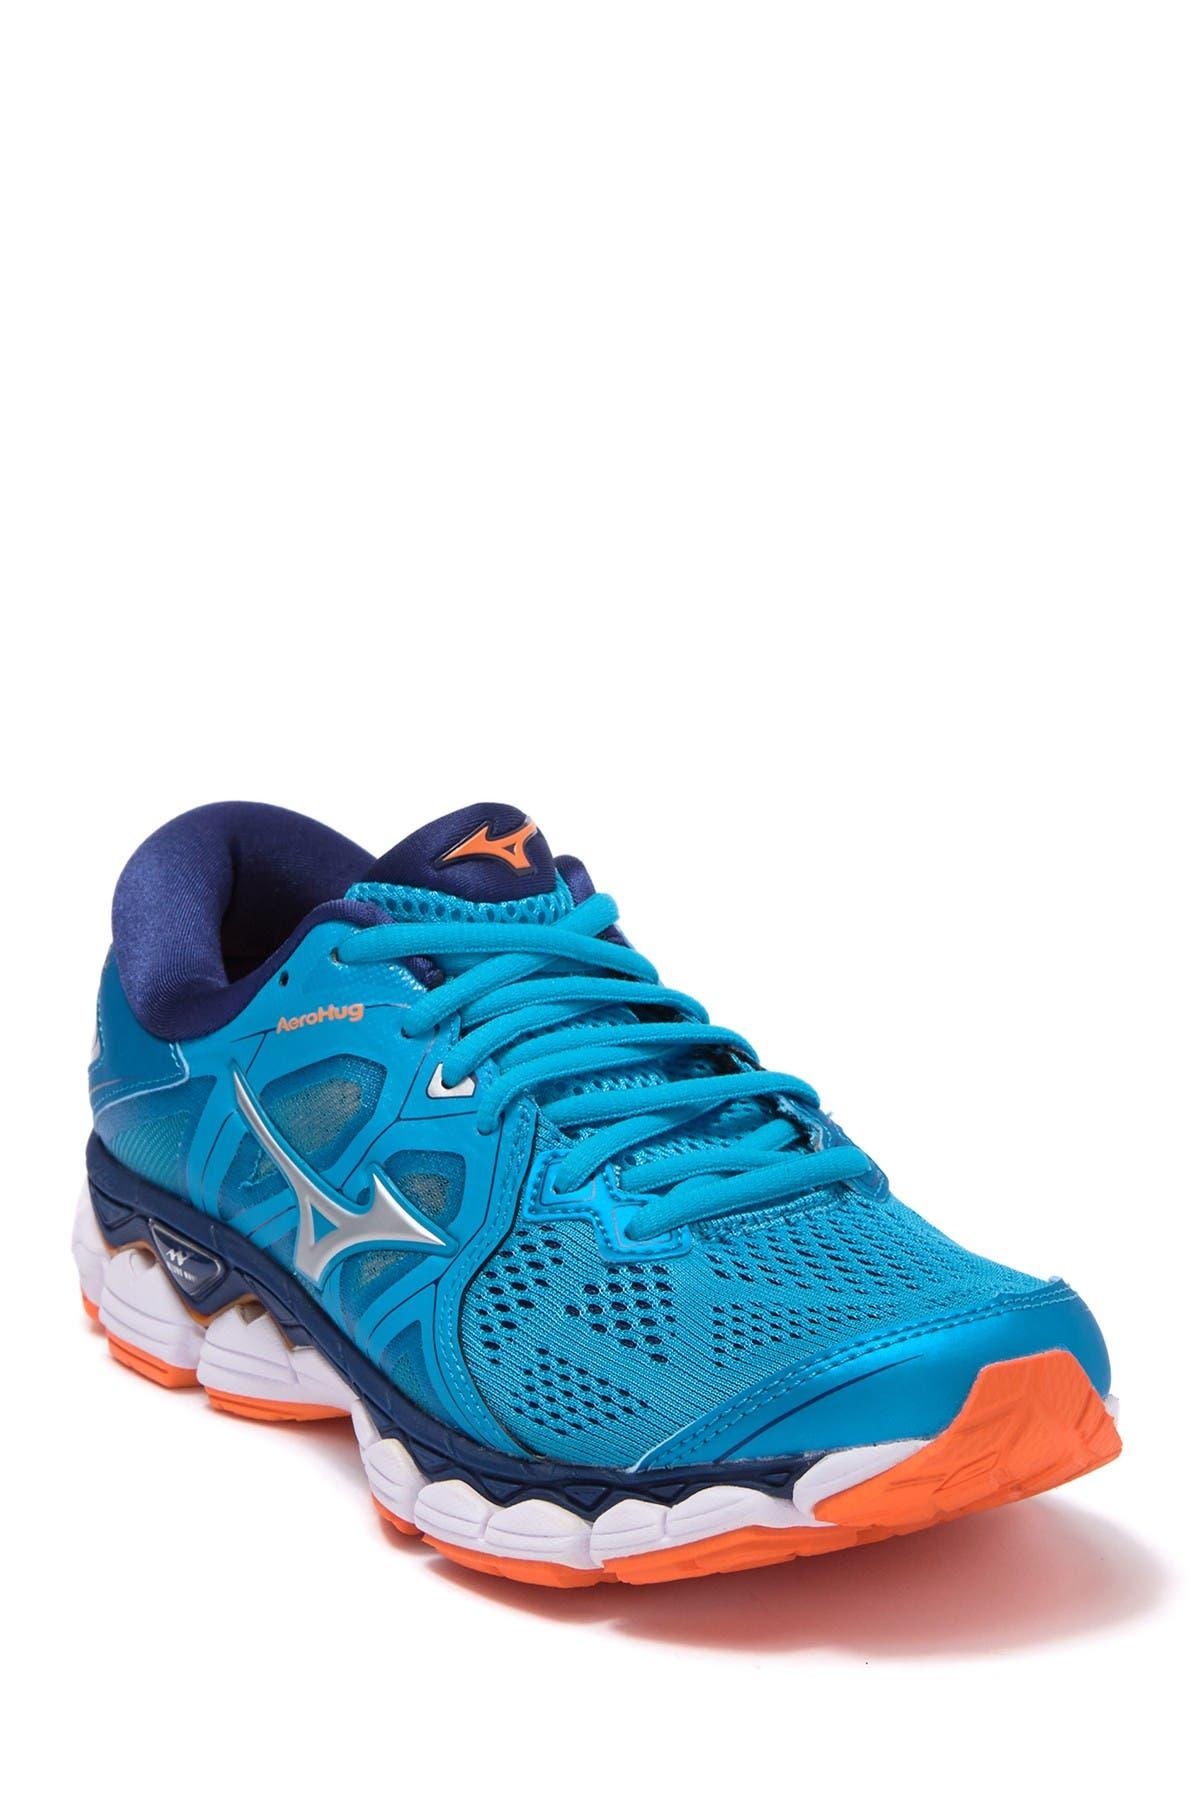 Image of Mizuno Wave Sky 2 Running Shoe